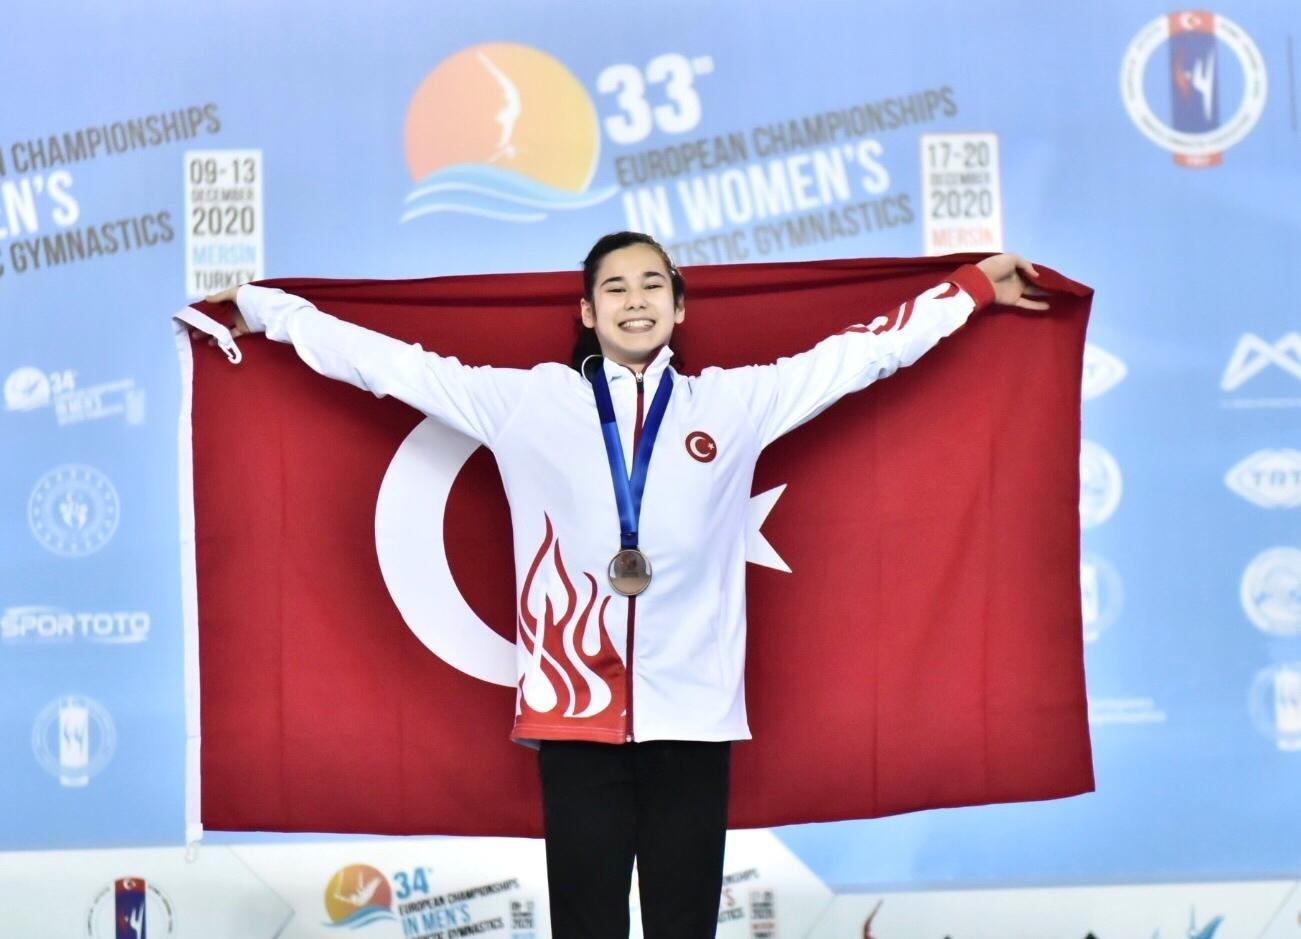 Turkish gymnast Derin Tanrıyaşükür poses for a photo holding a Turkish flag after winning a bronze medal at the competition, Dec. 20, 2020. (AA Photo)